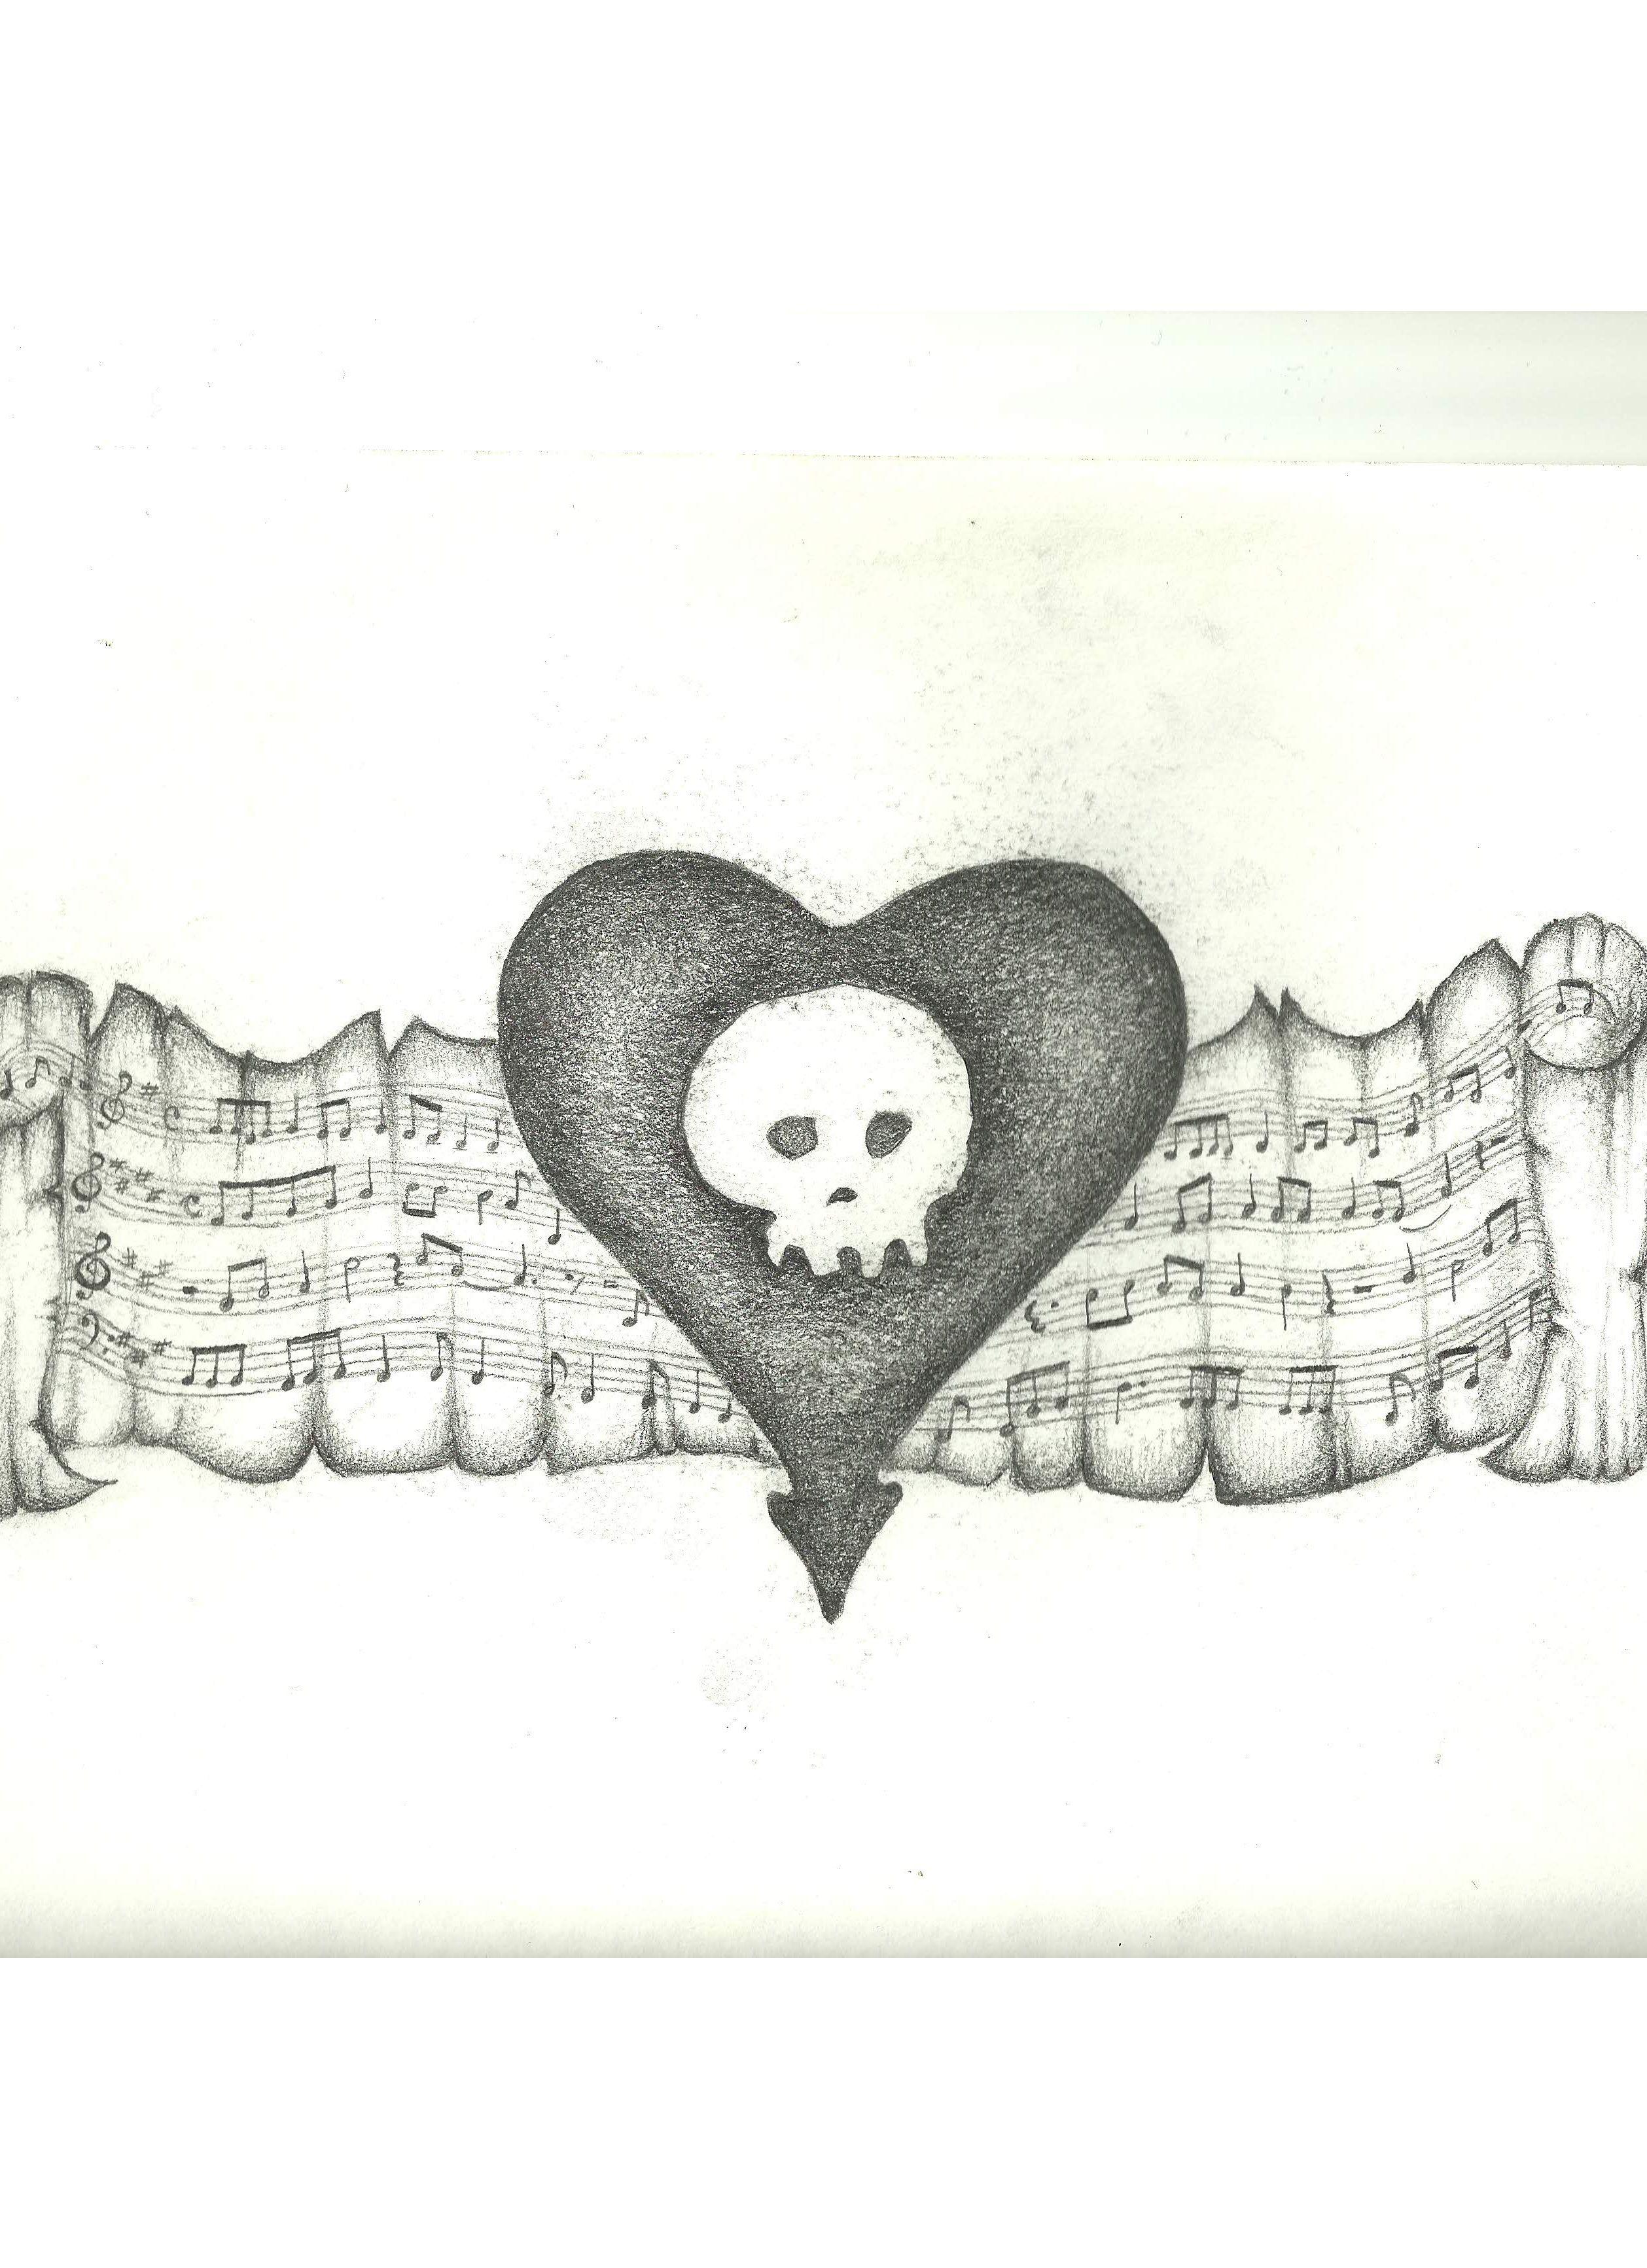 Permanent Sketch Book: Alkaline Trio Heart Tattoo Design-From My Sketchbook